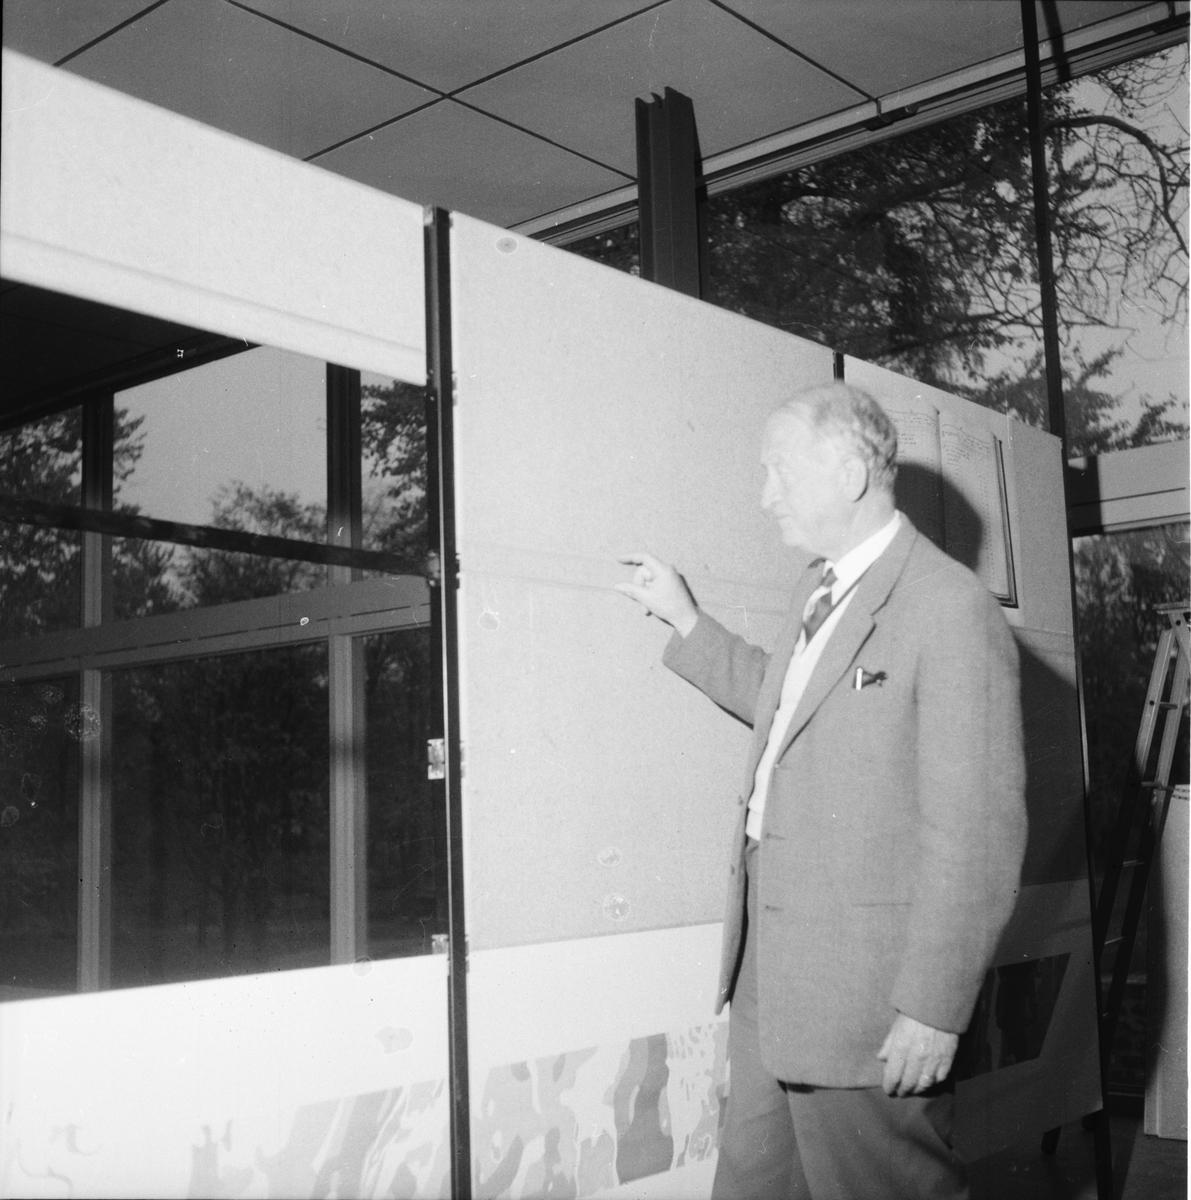 Silvanum, Gävle, 8 okt. 1960